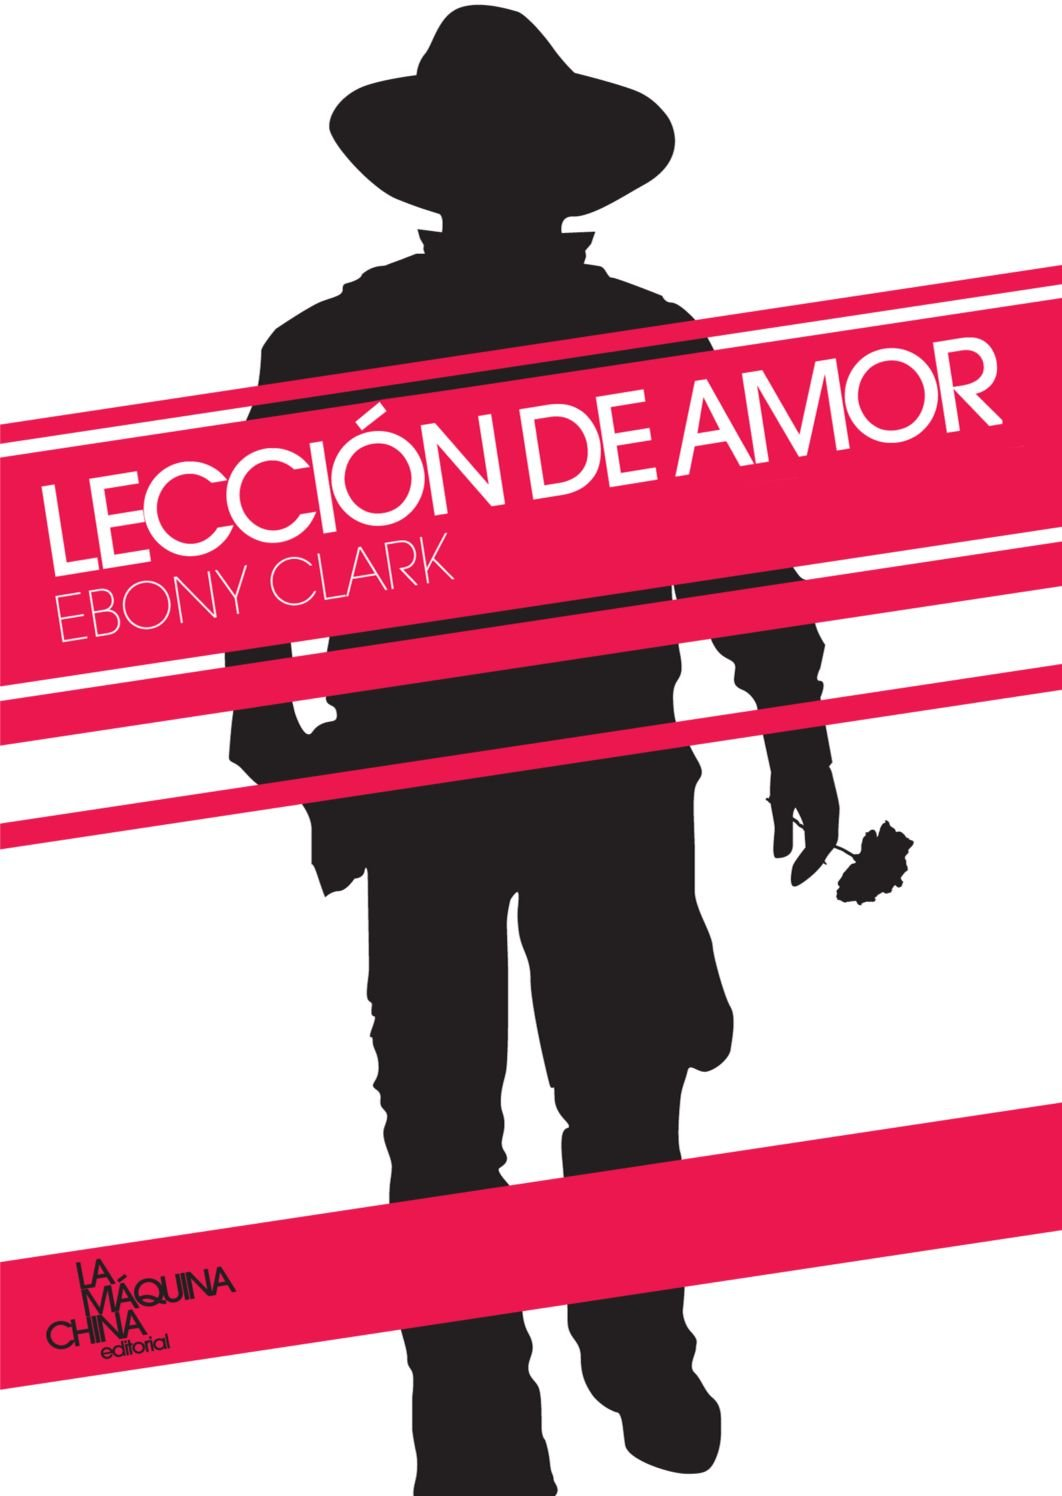 Ebony Clark - Lecion de Amor 61u13ggEaeL